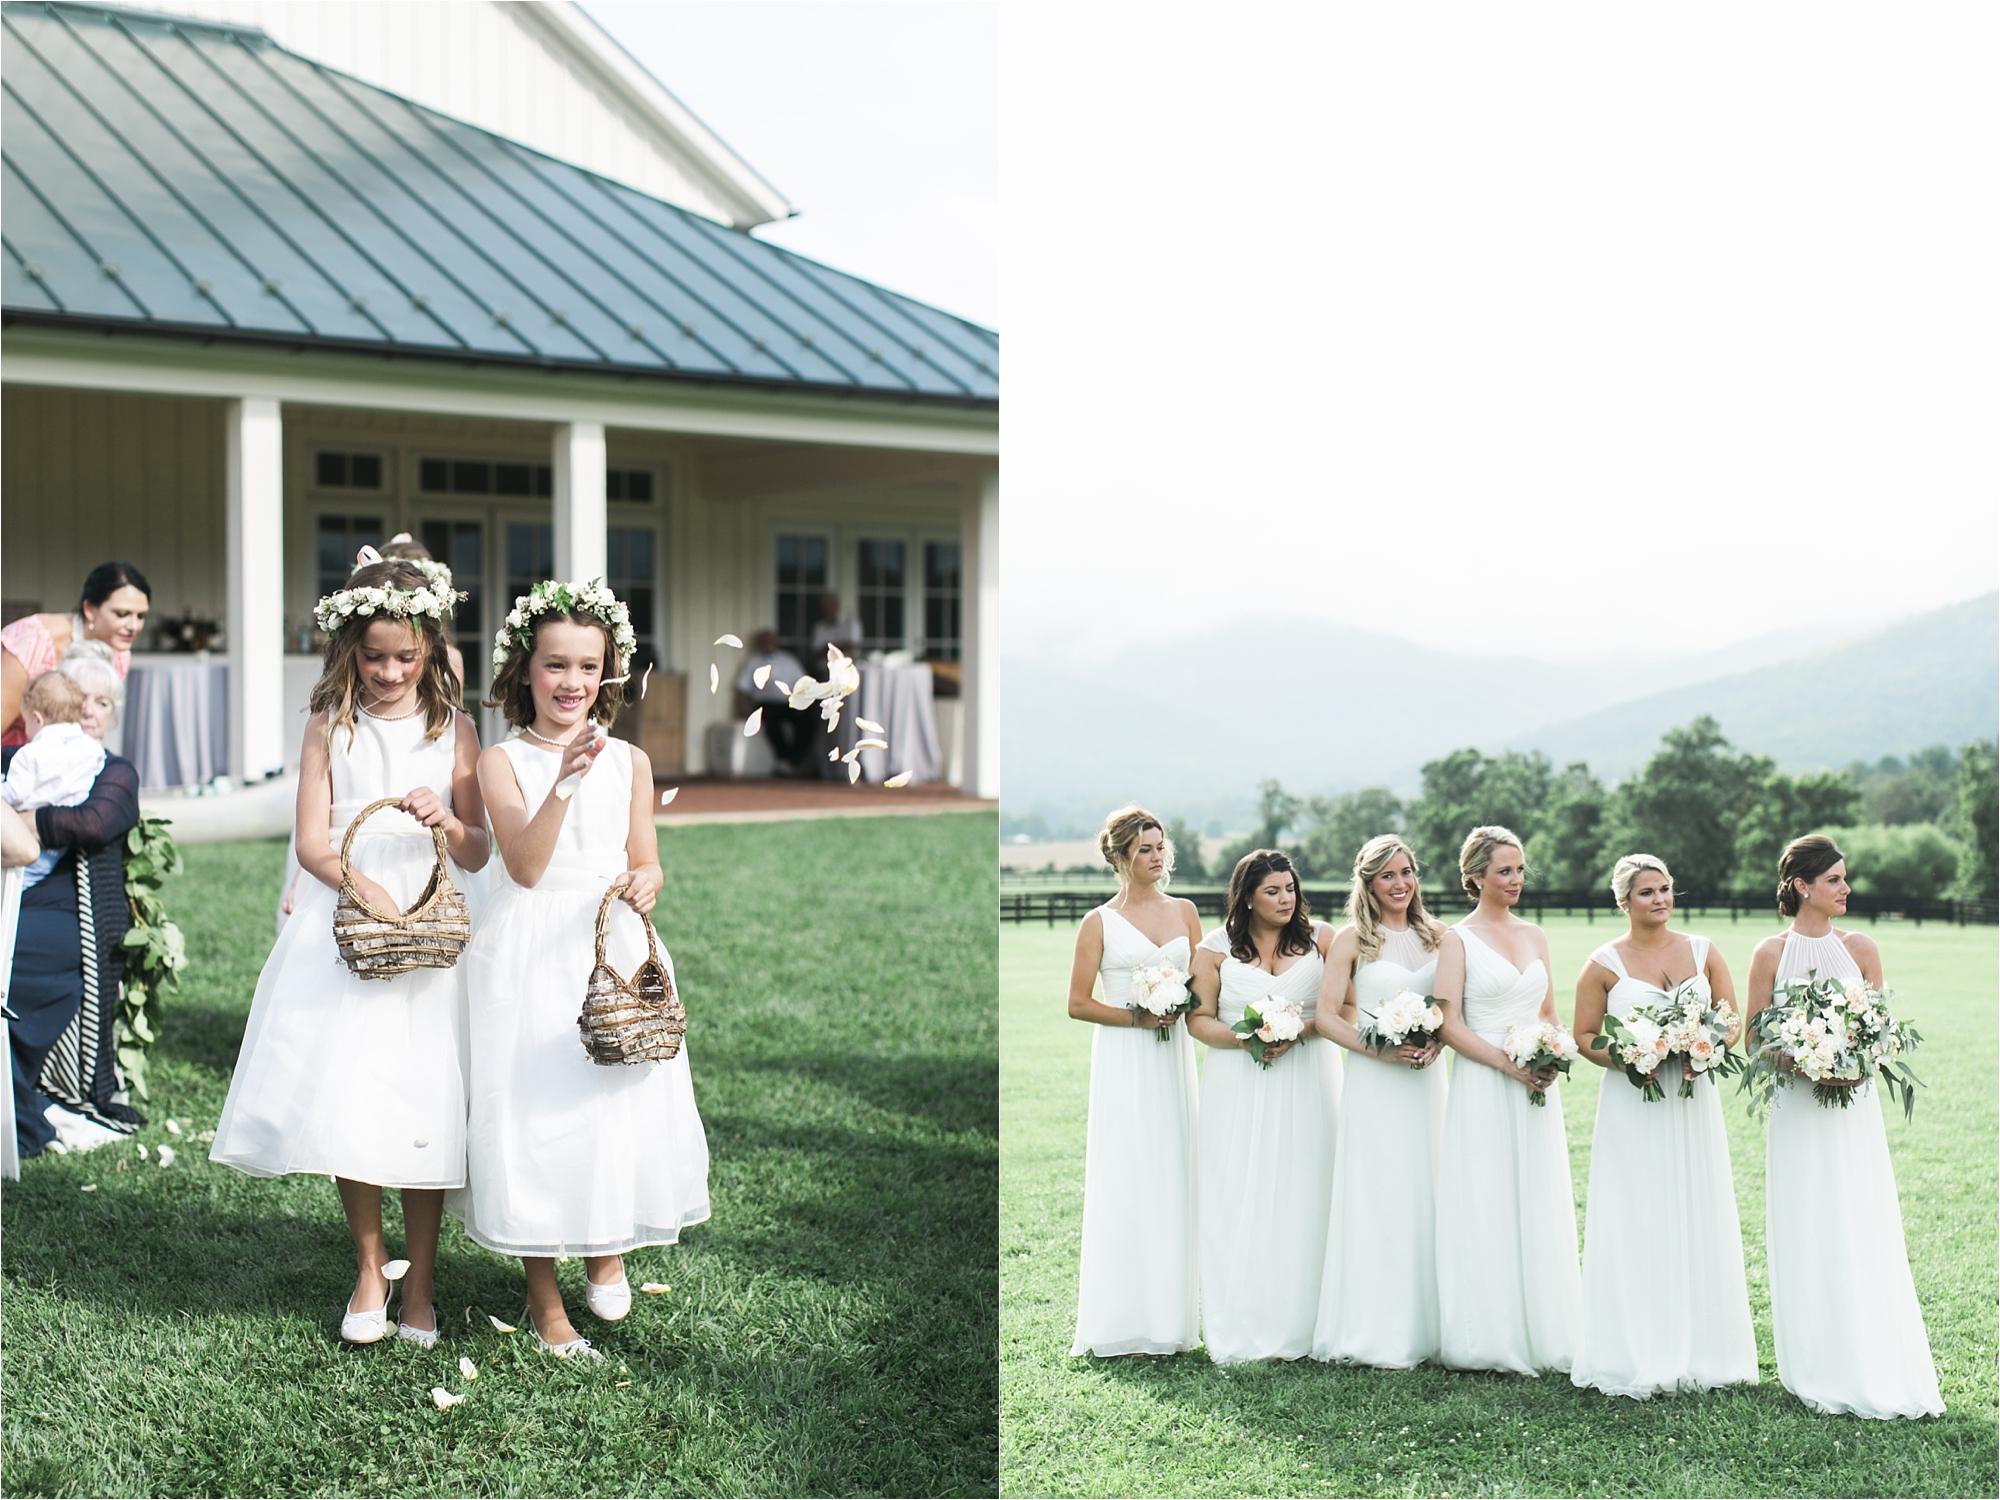 stephanie-yonce-charlottesville-virginia-king-family-vineyard-wedding-photos_0034.jpg